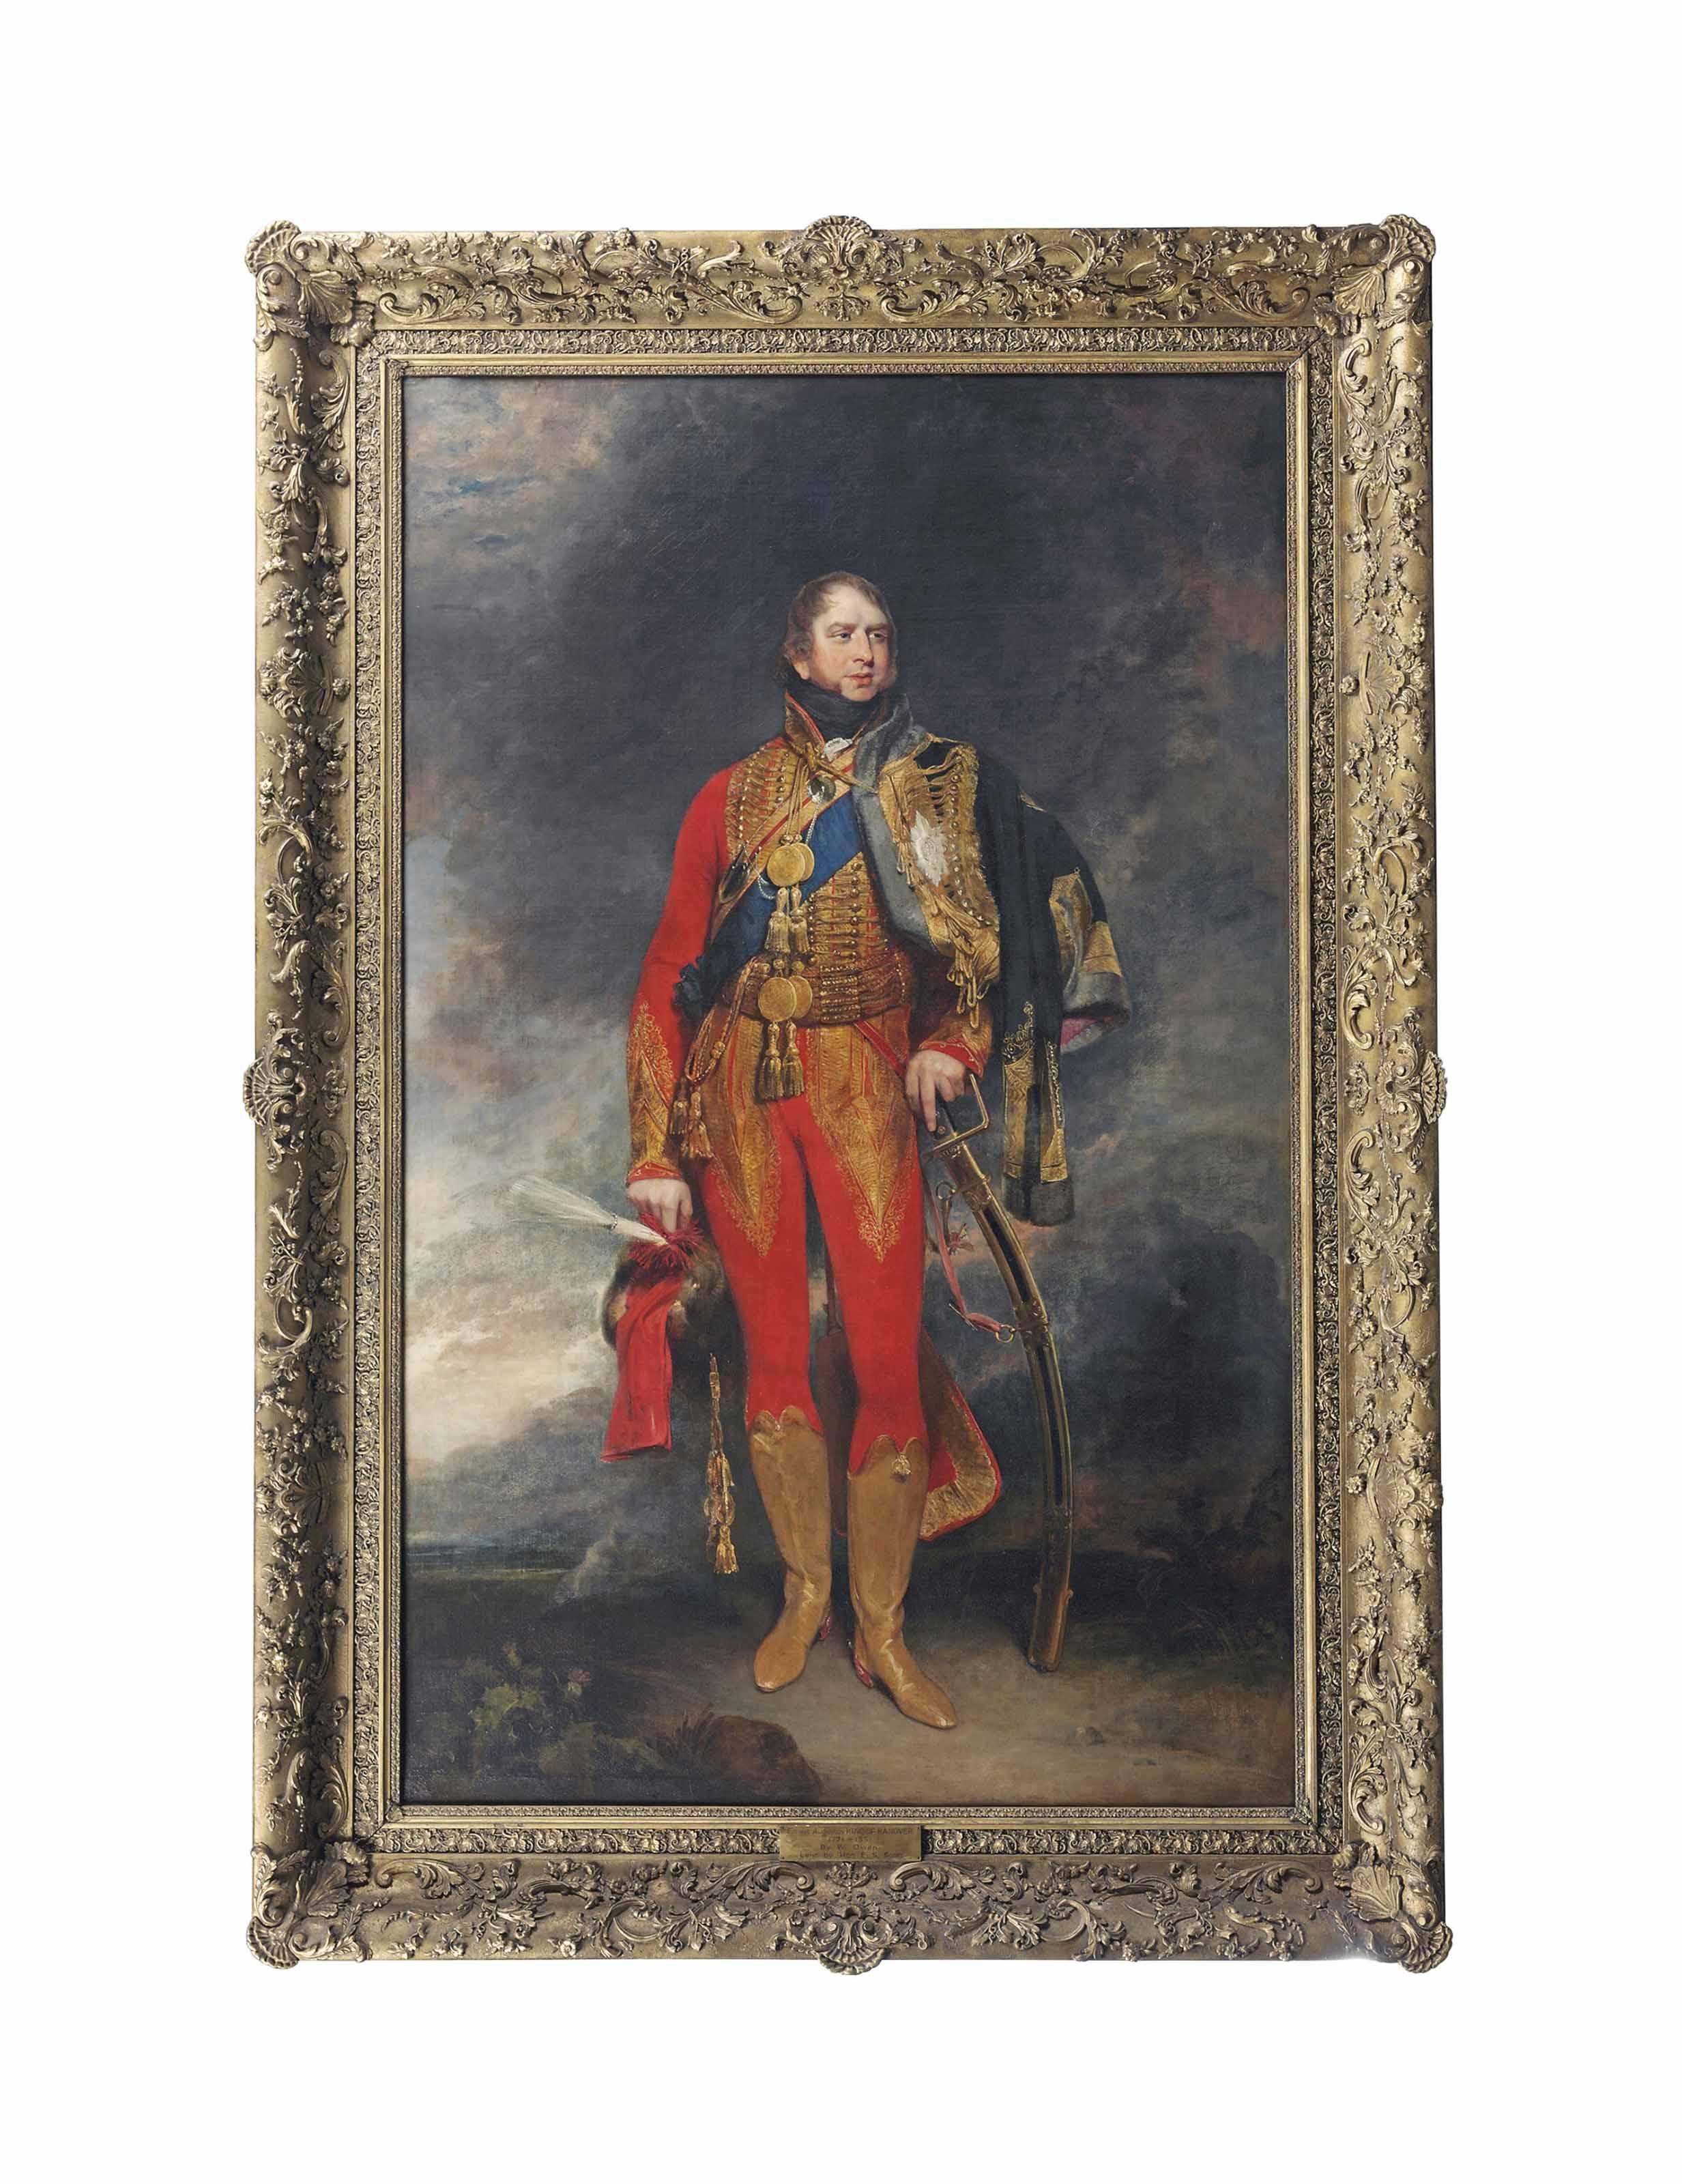 William Owen (Ludlow 1769-1825